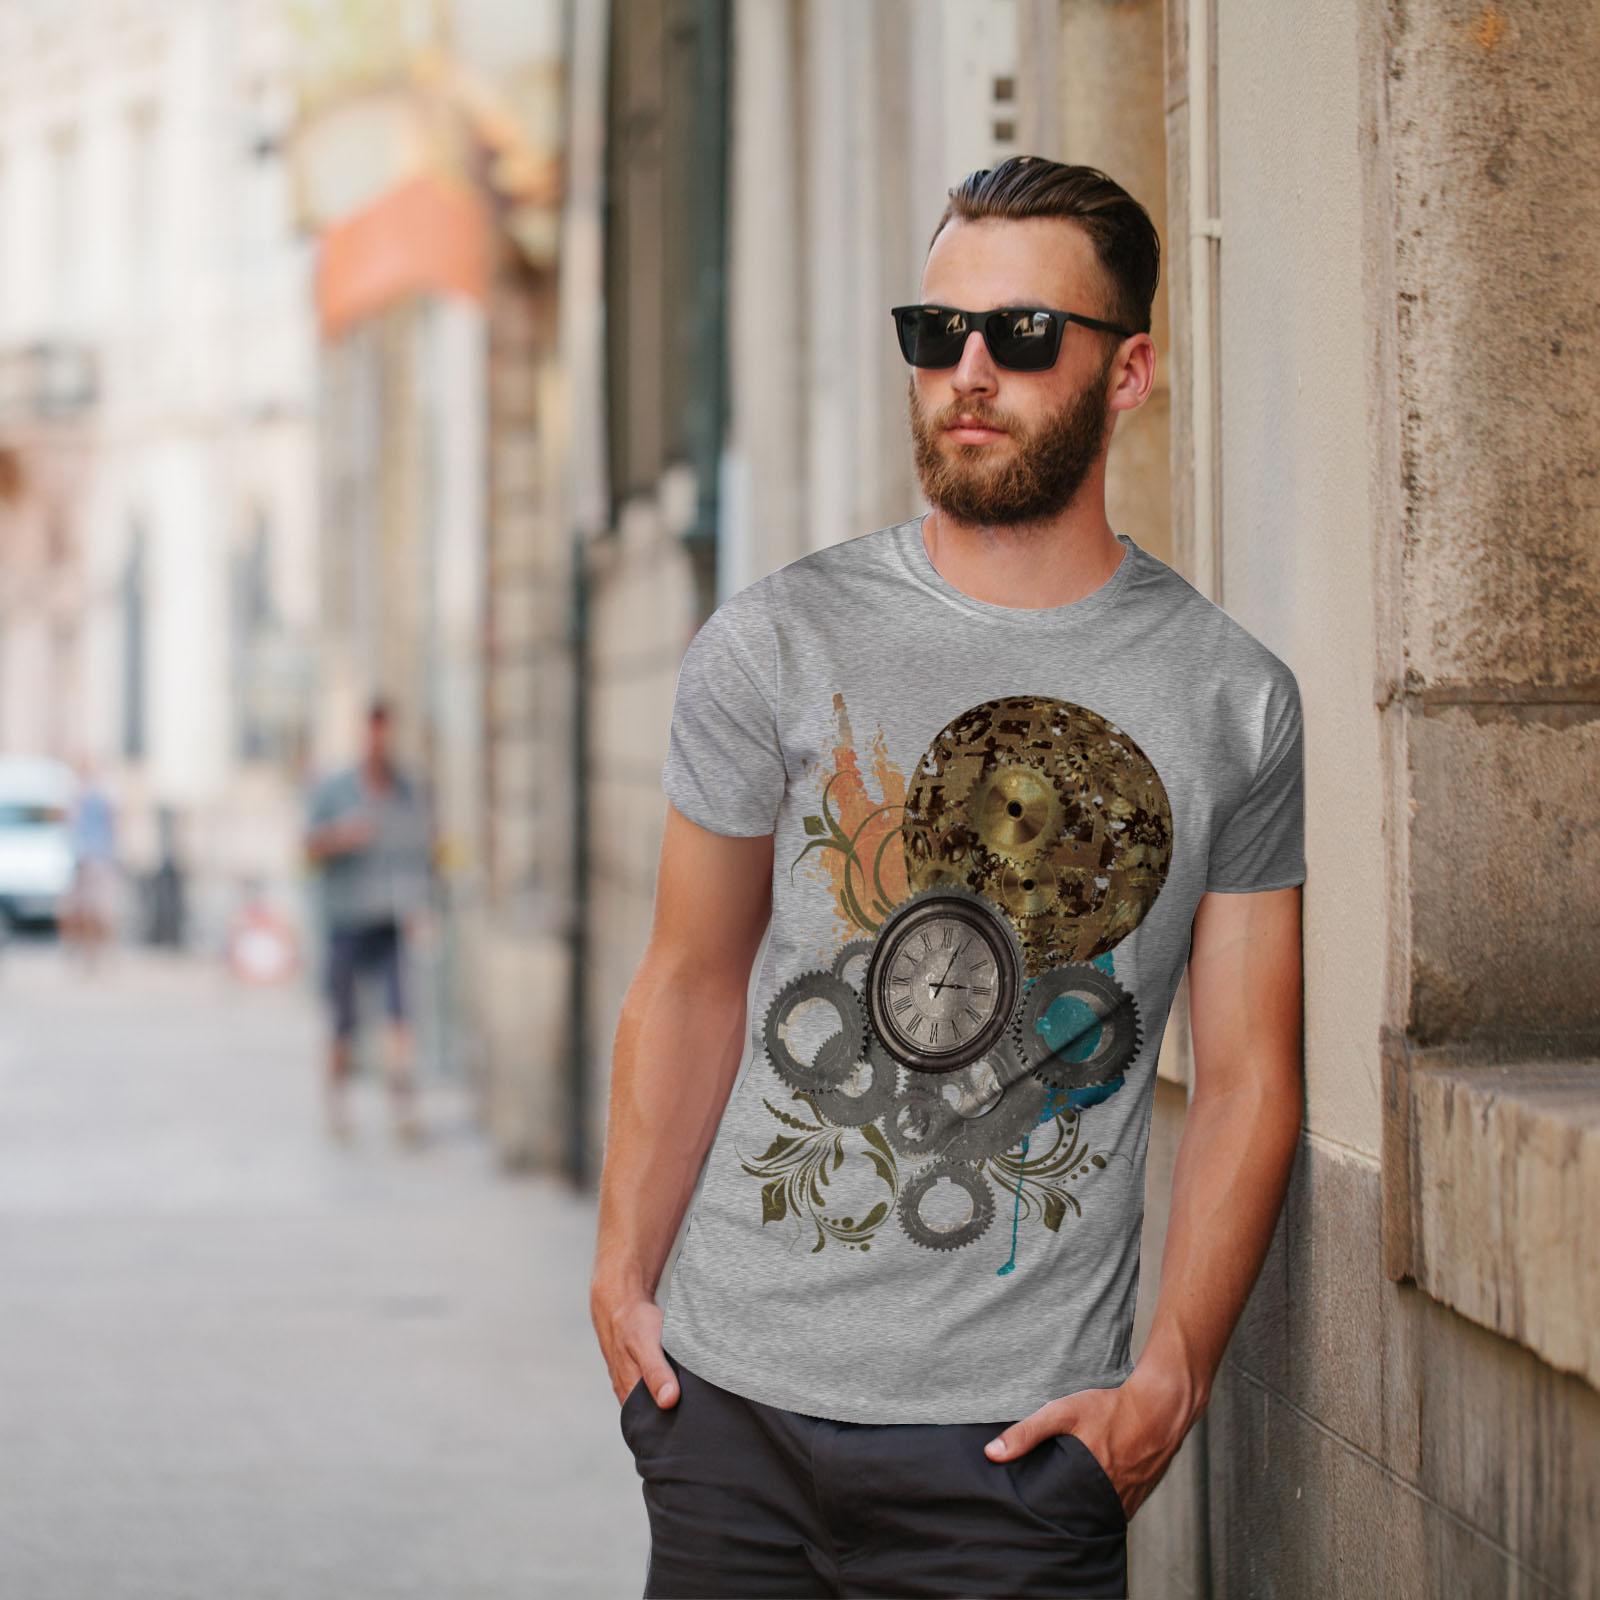 Wellcoda-Clock-Cool-Print-Mens-T-shirt-Illusion-Graphic-Design-Printed-Tee thumbnail 17